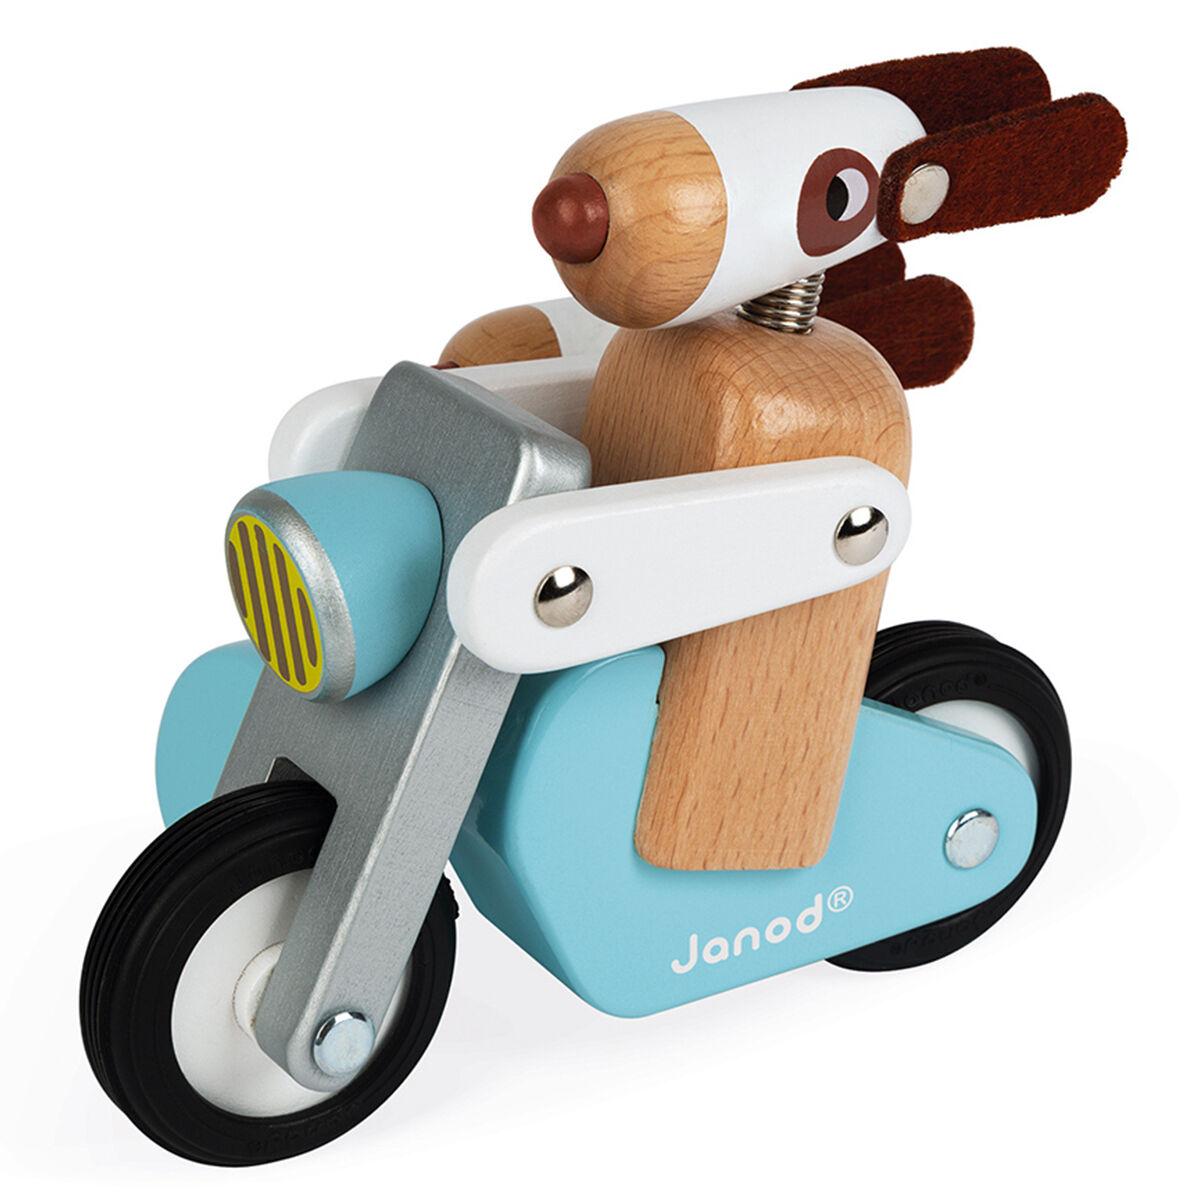 Janod Sidecar Spirit Philip